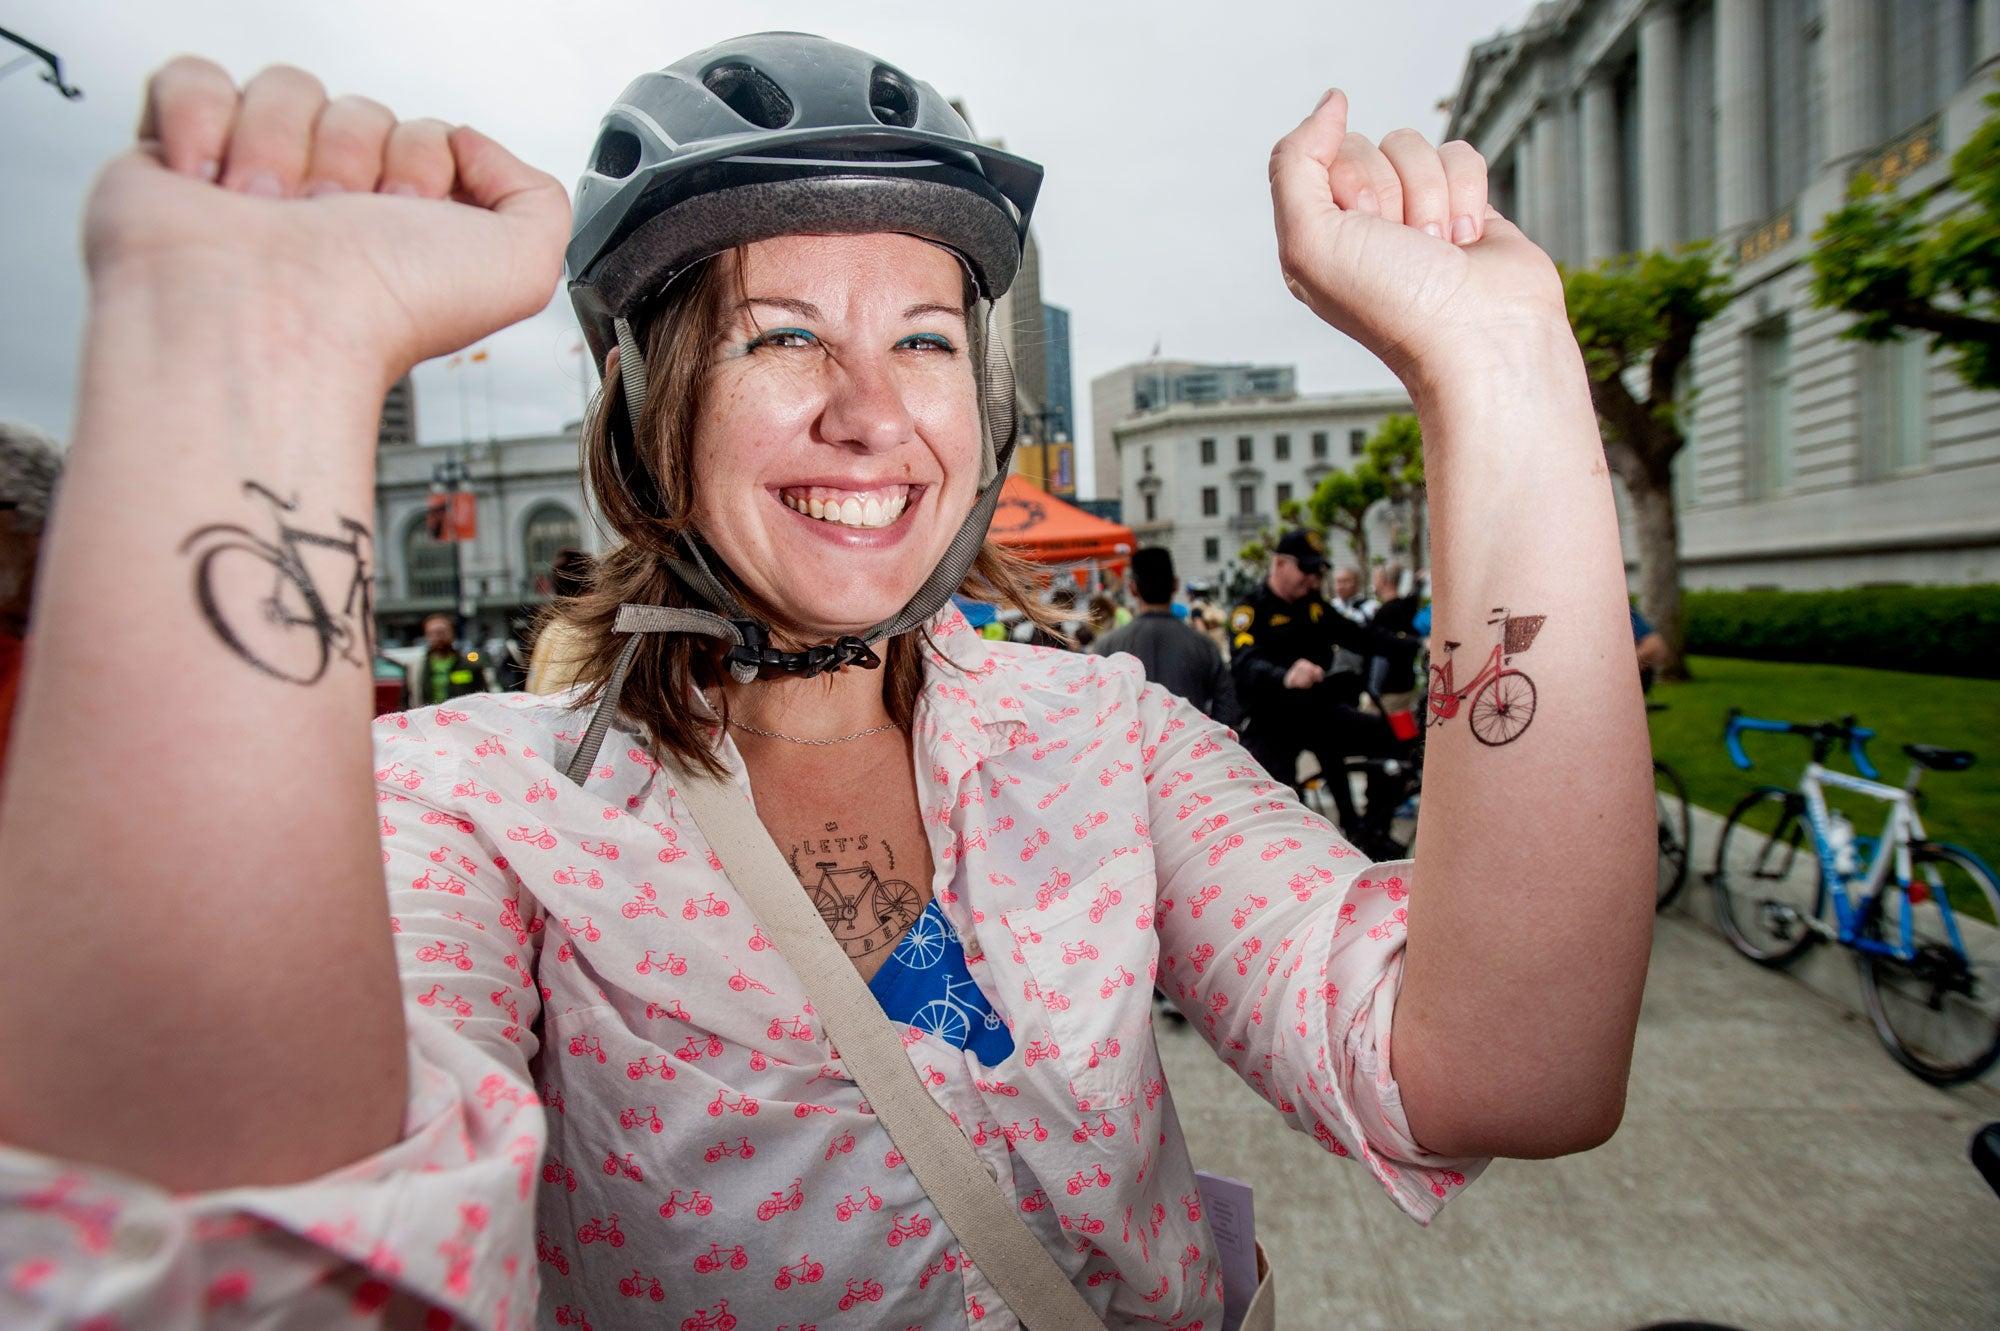 SF bike rider on Bike-to-Work Day 2014